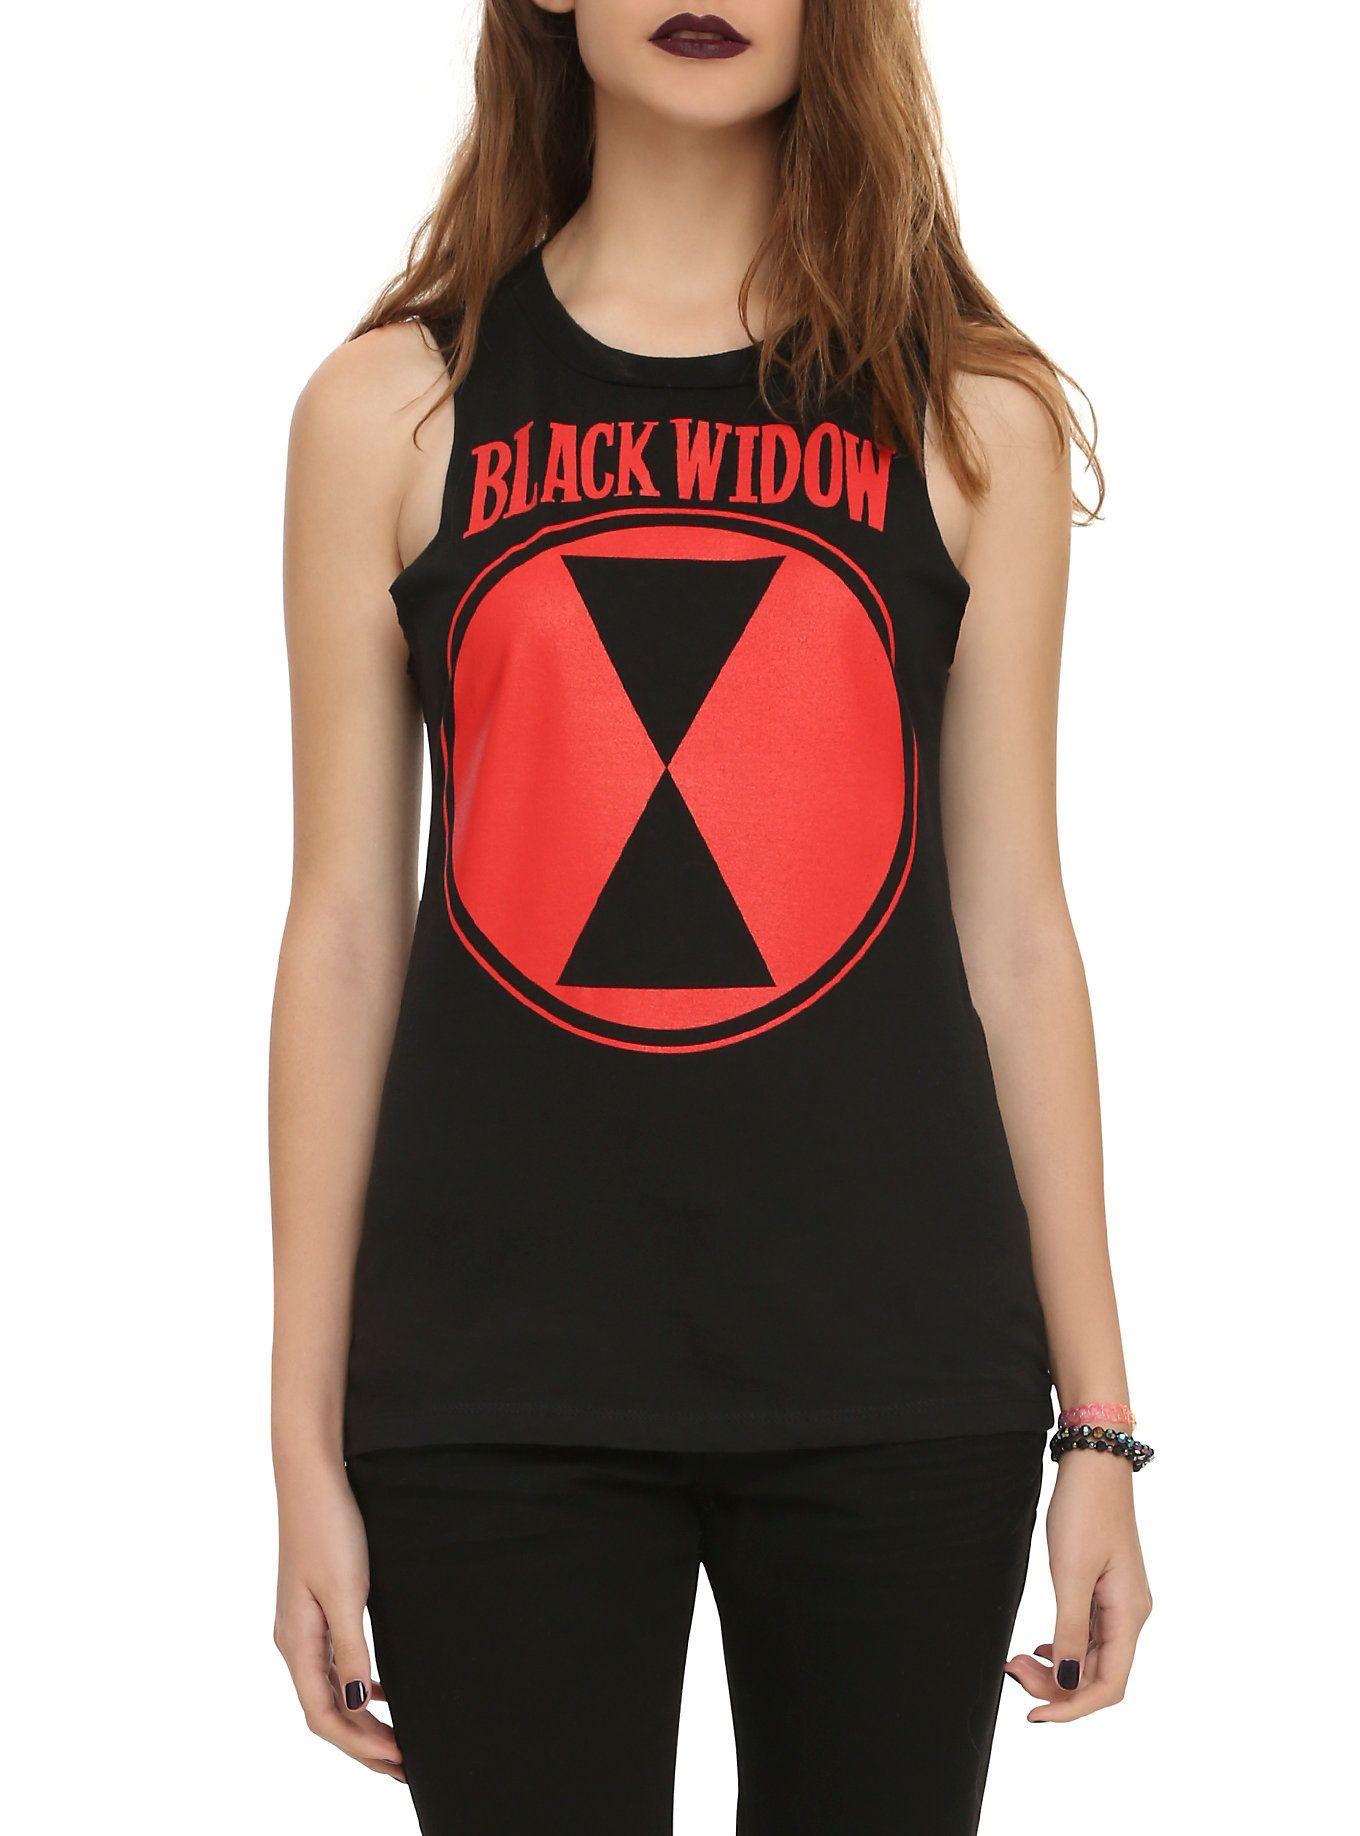 Black widow t shirt hot topic - Sleeveless Black Top From Marvel With Black Widow Logo Design Ul Li